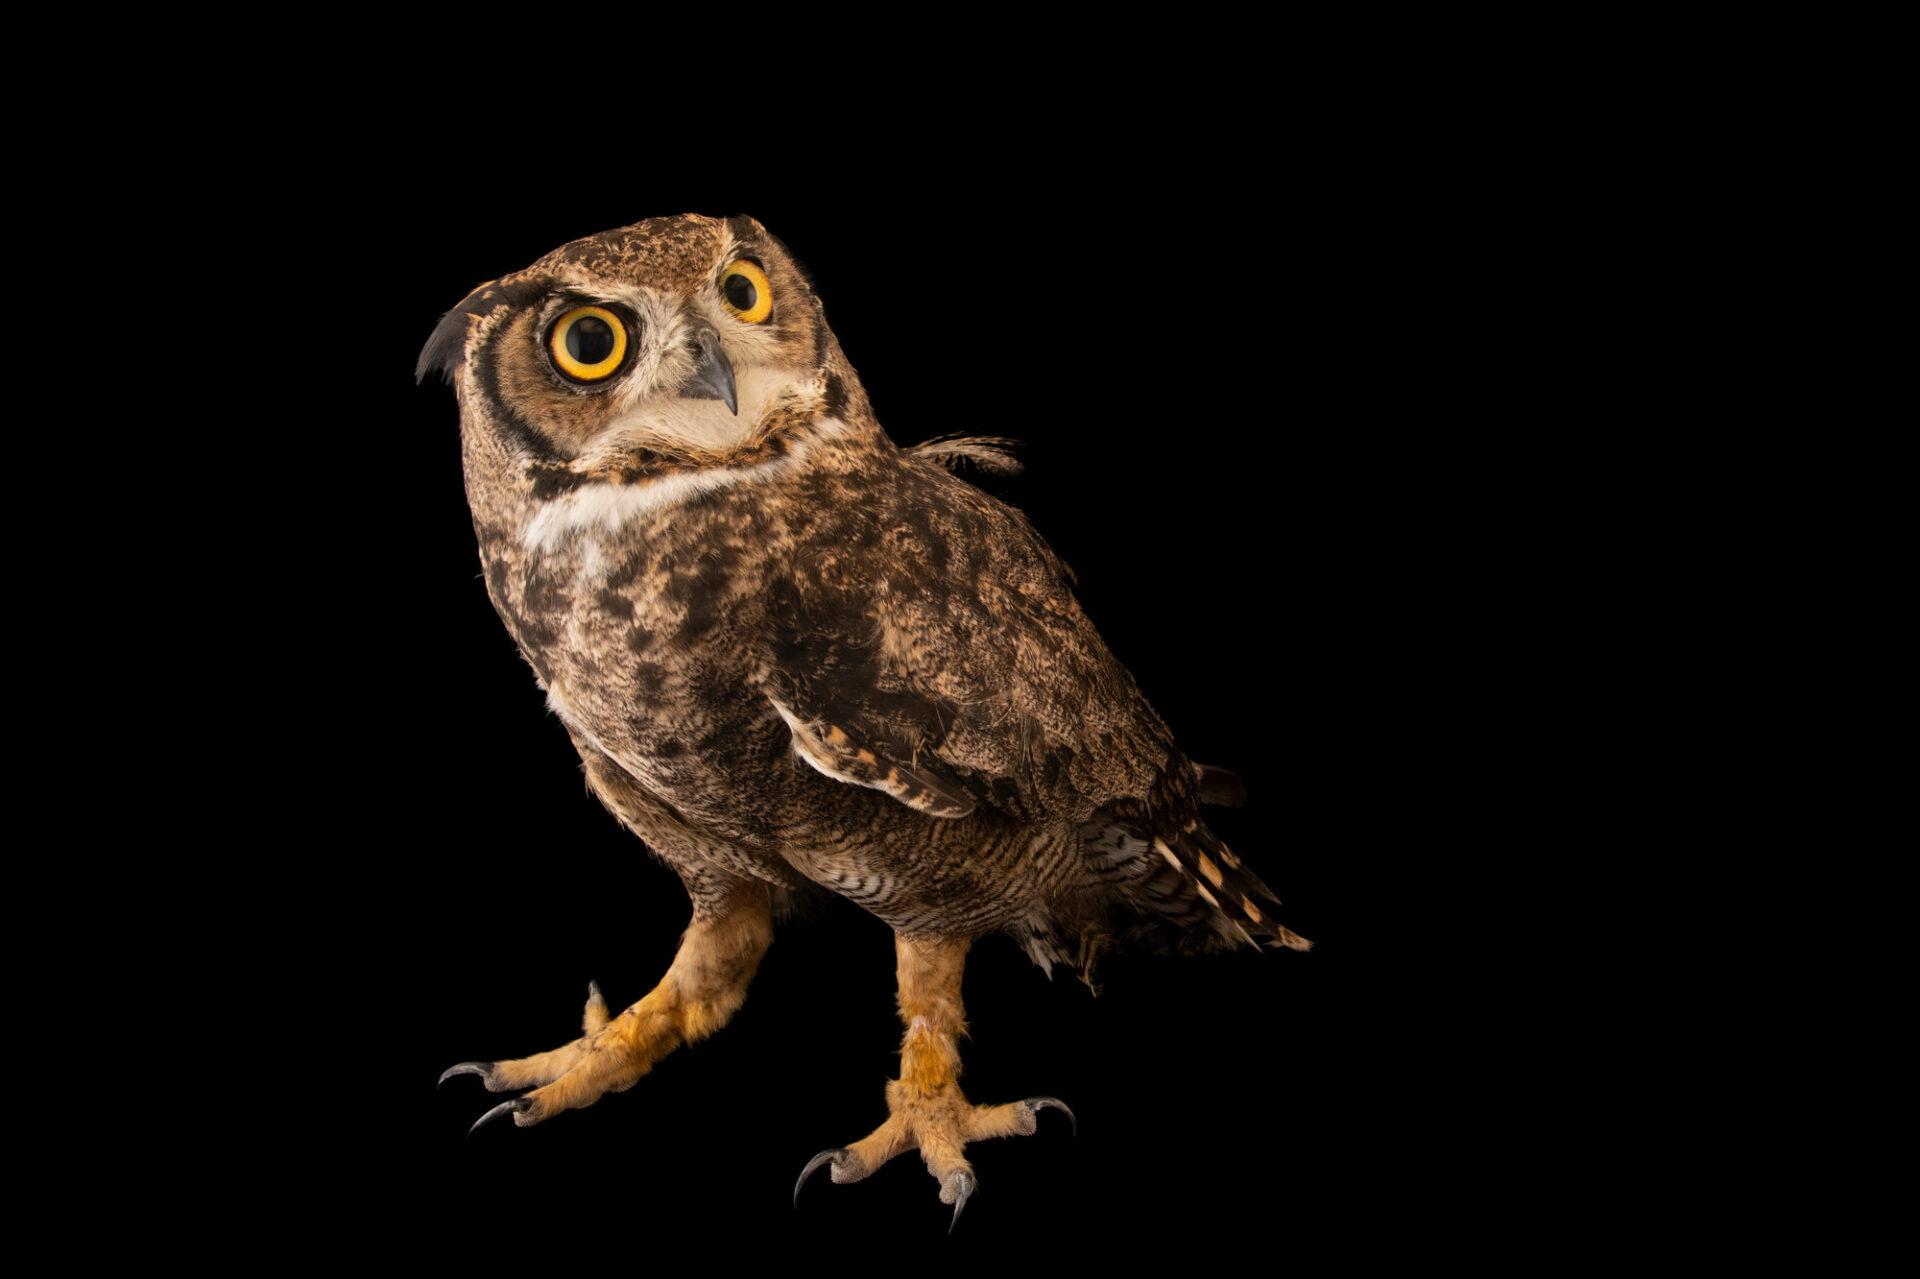 Photo: A Magellanic owl (Bubo magellanicus) at the Santiago Zoo in Chile.